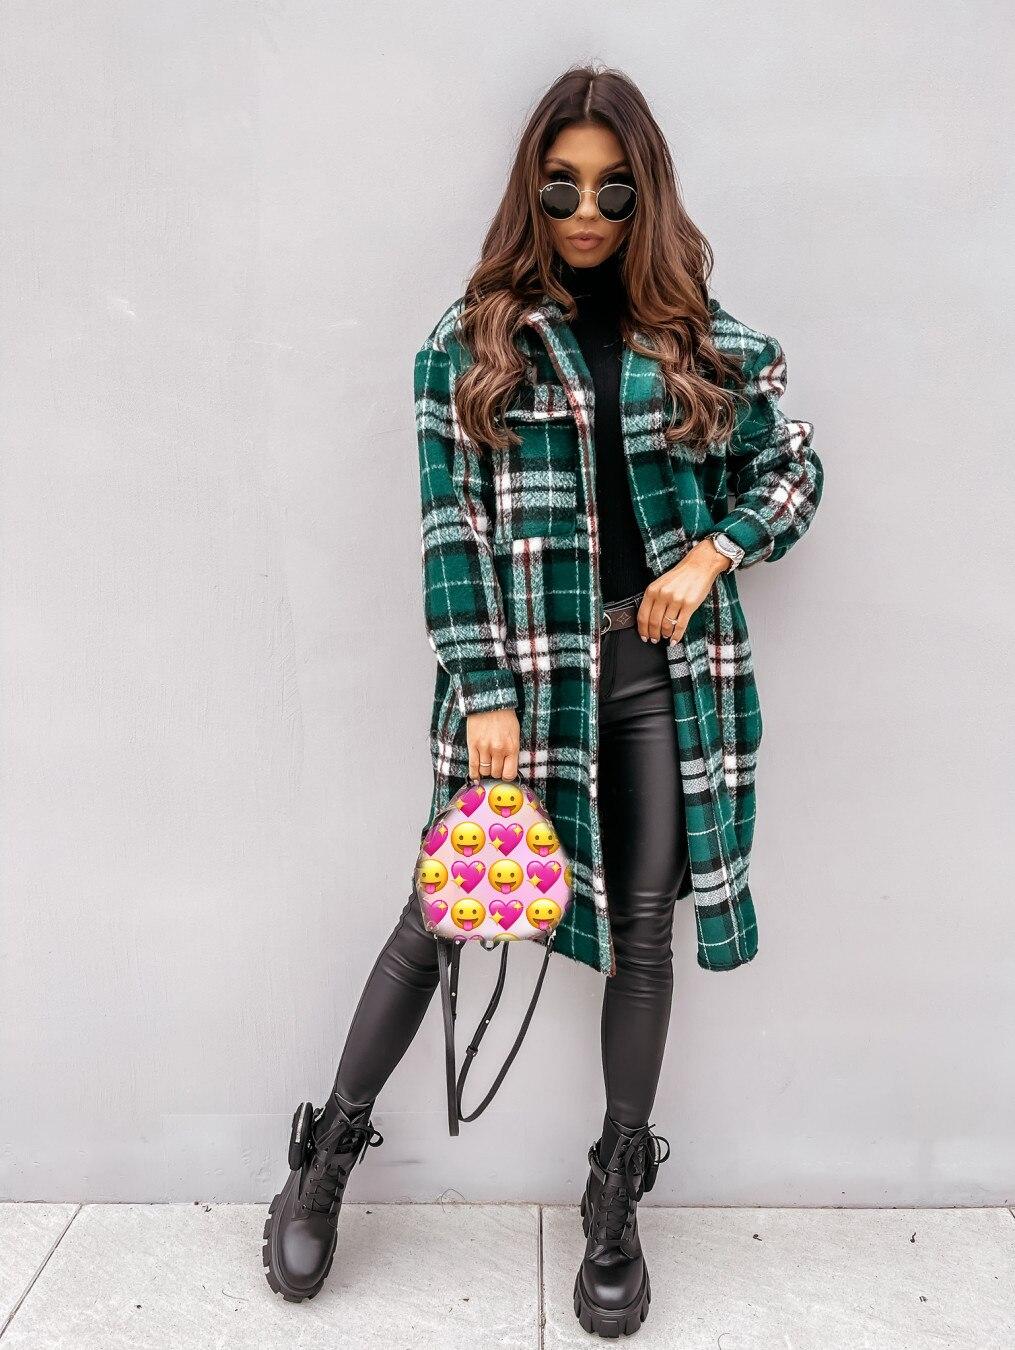 2021 New Harejuku Plaid Jacket Women's Casual Loose Plus Size Blend Coat Long Sleeve Warm Trench Coat Female Chic Tops Overcoat